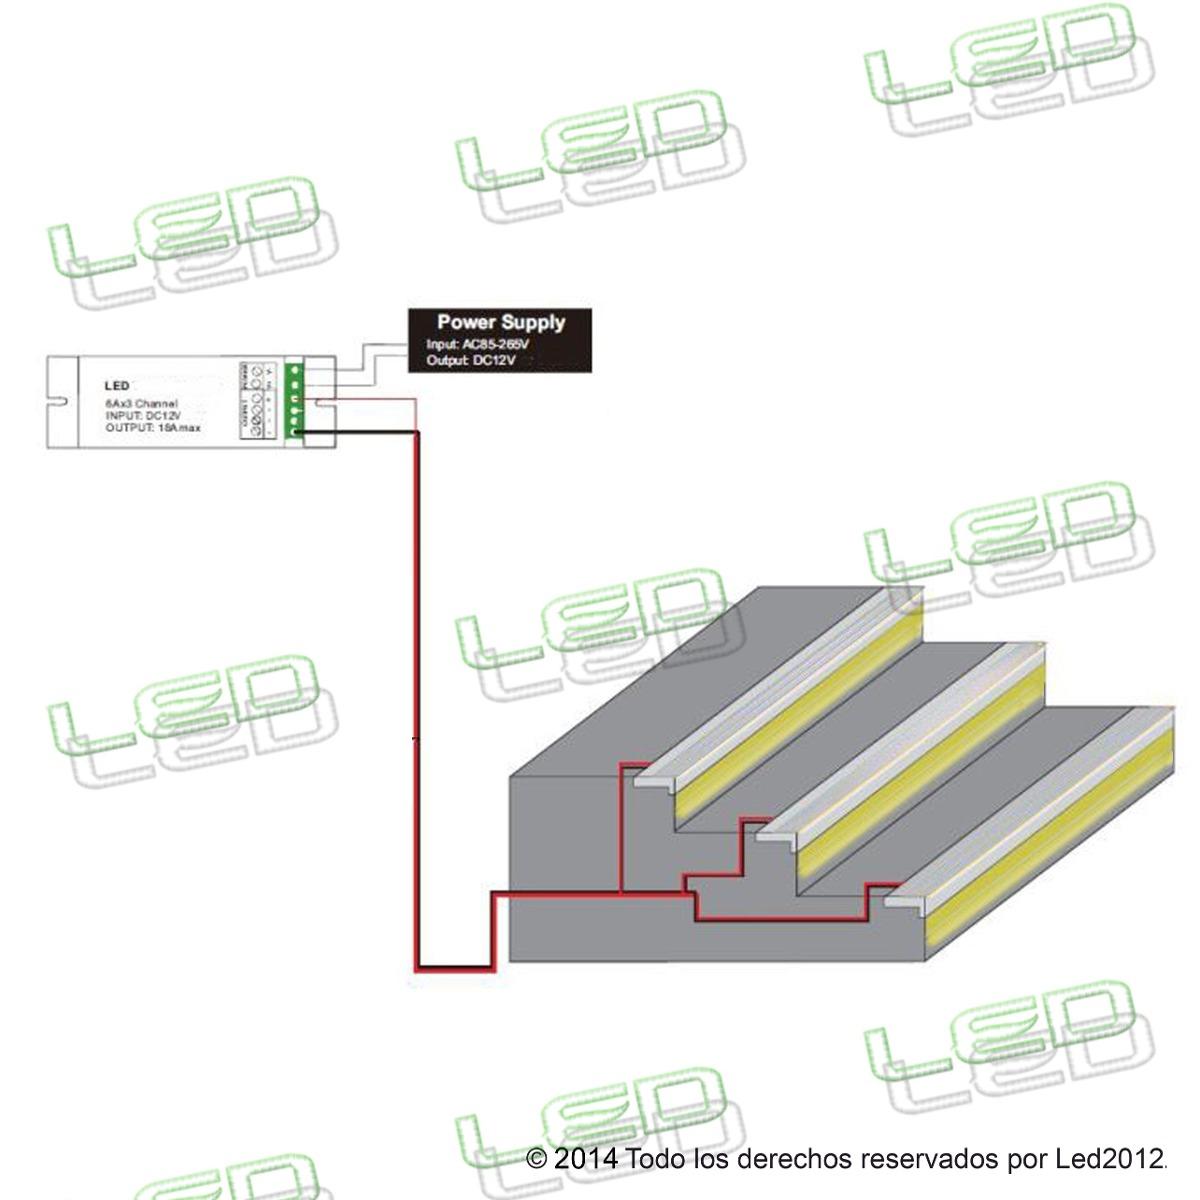 Perfil para escalera o escal n tira o cintas led 2metros - Leds para escaleras ...